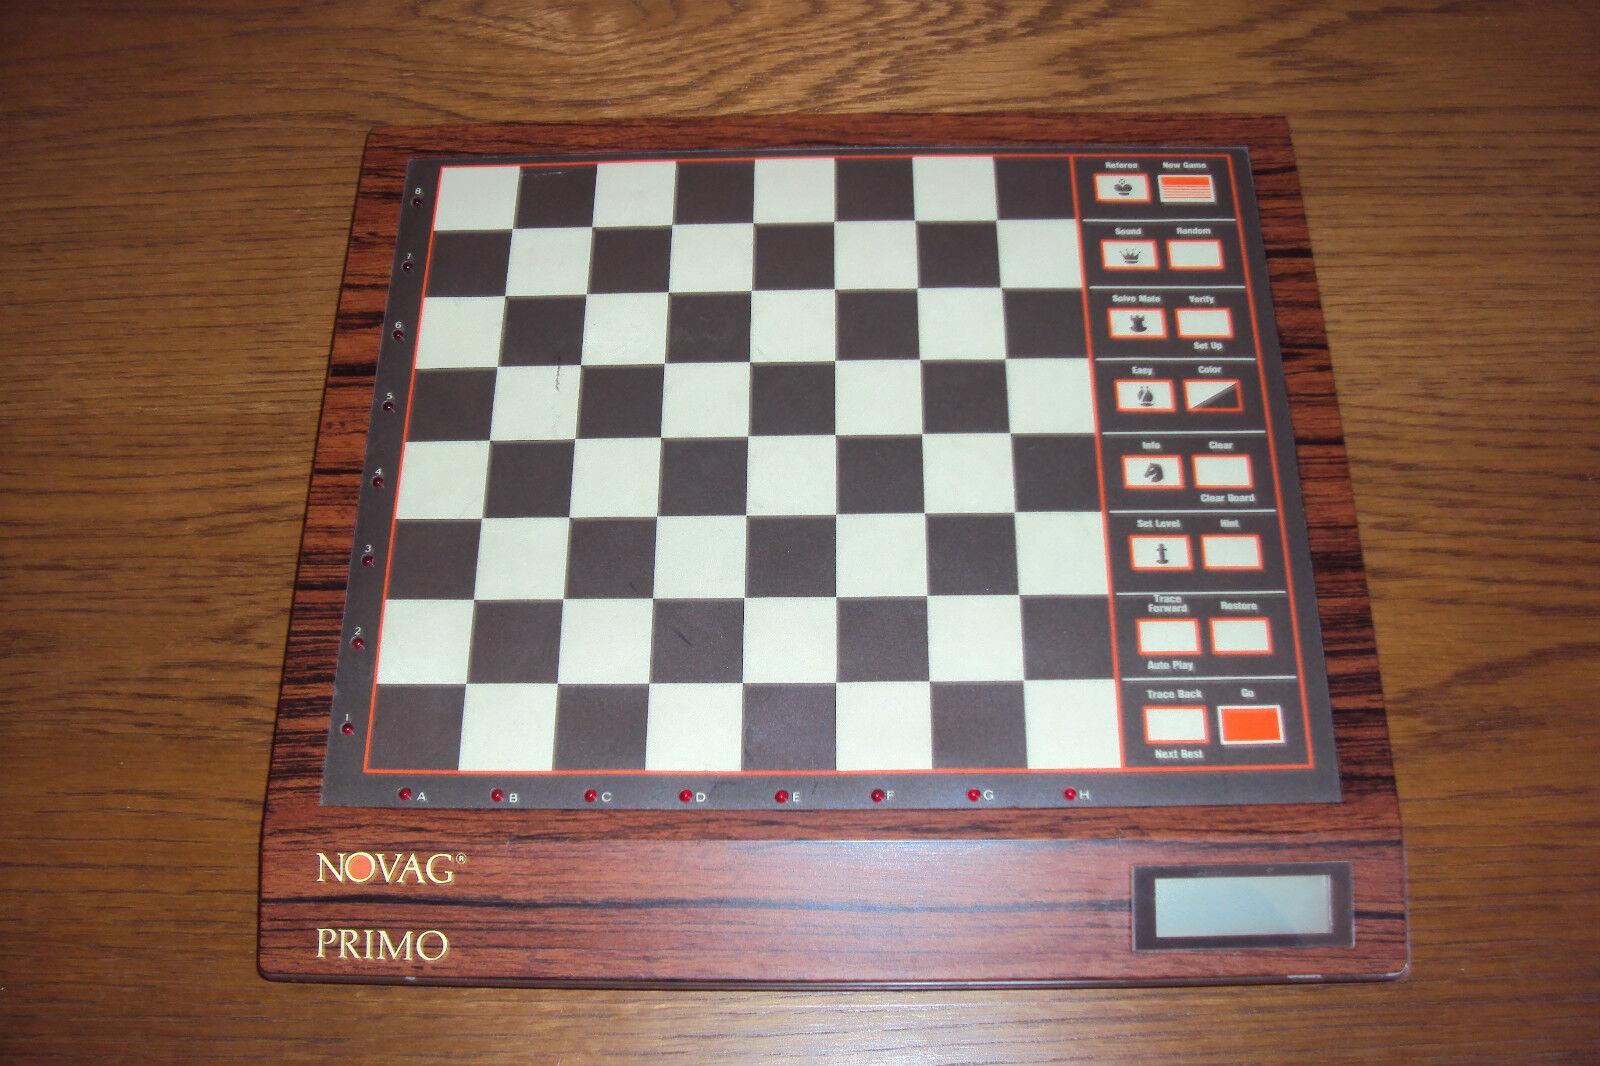 Novag Primo vintage Schachcomputer chess computer Schach 70er 70s 80er